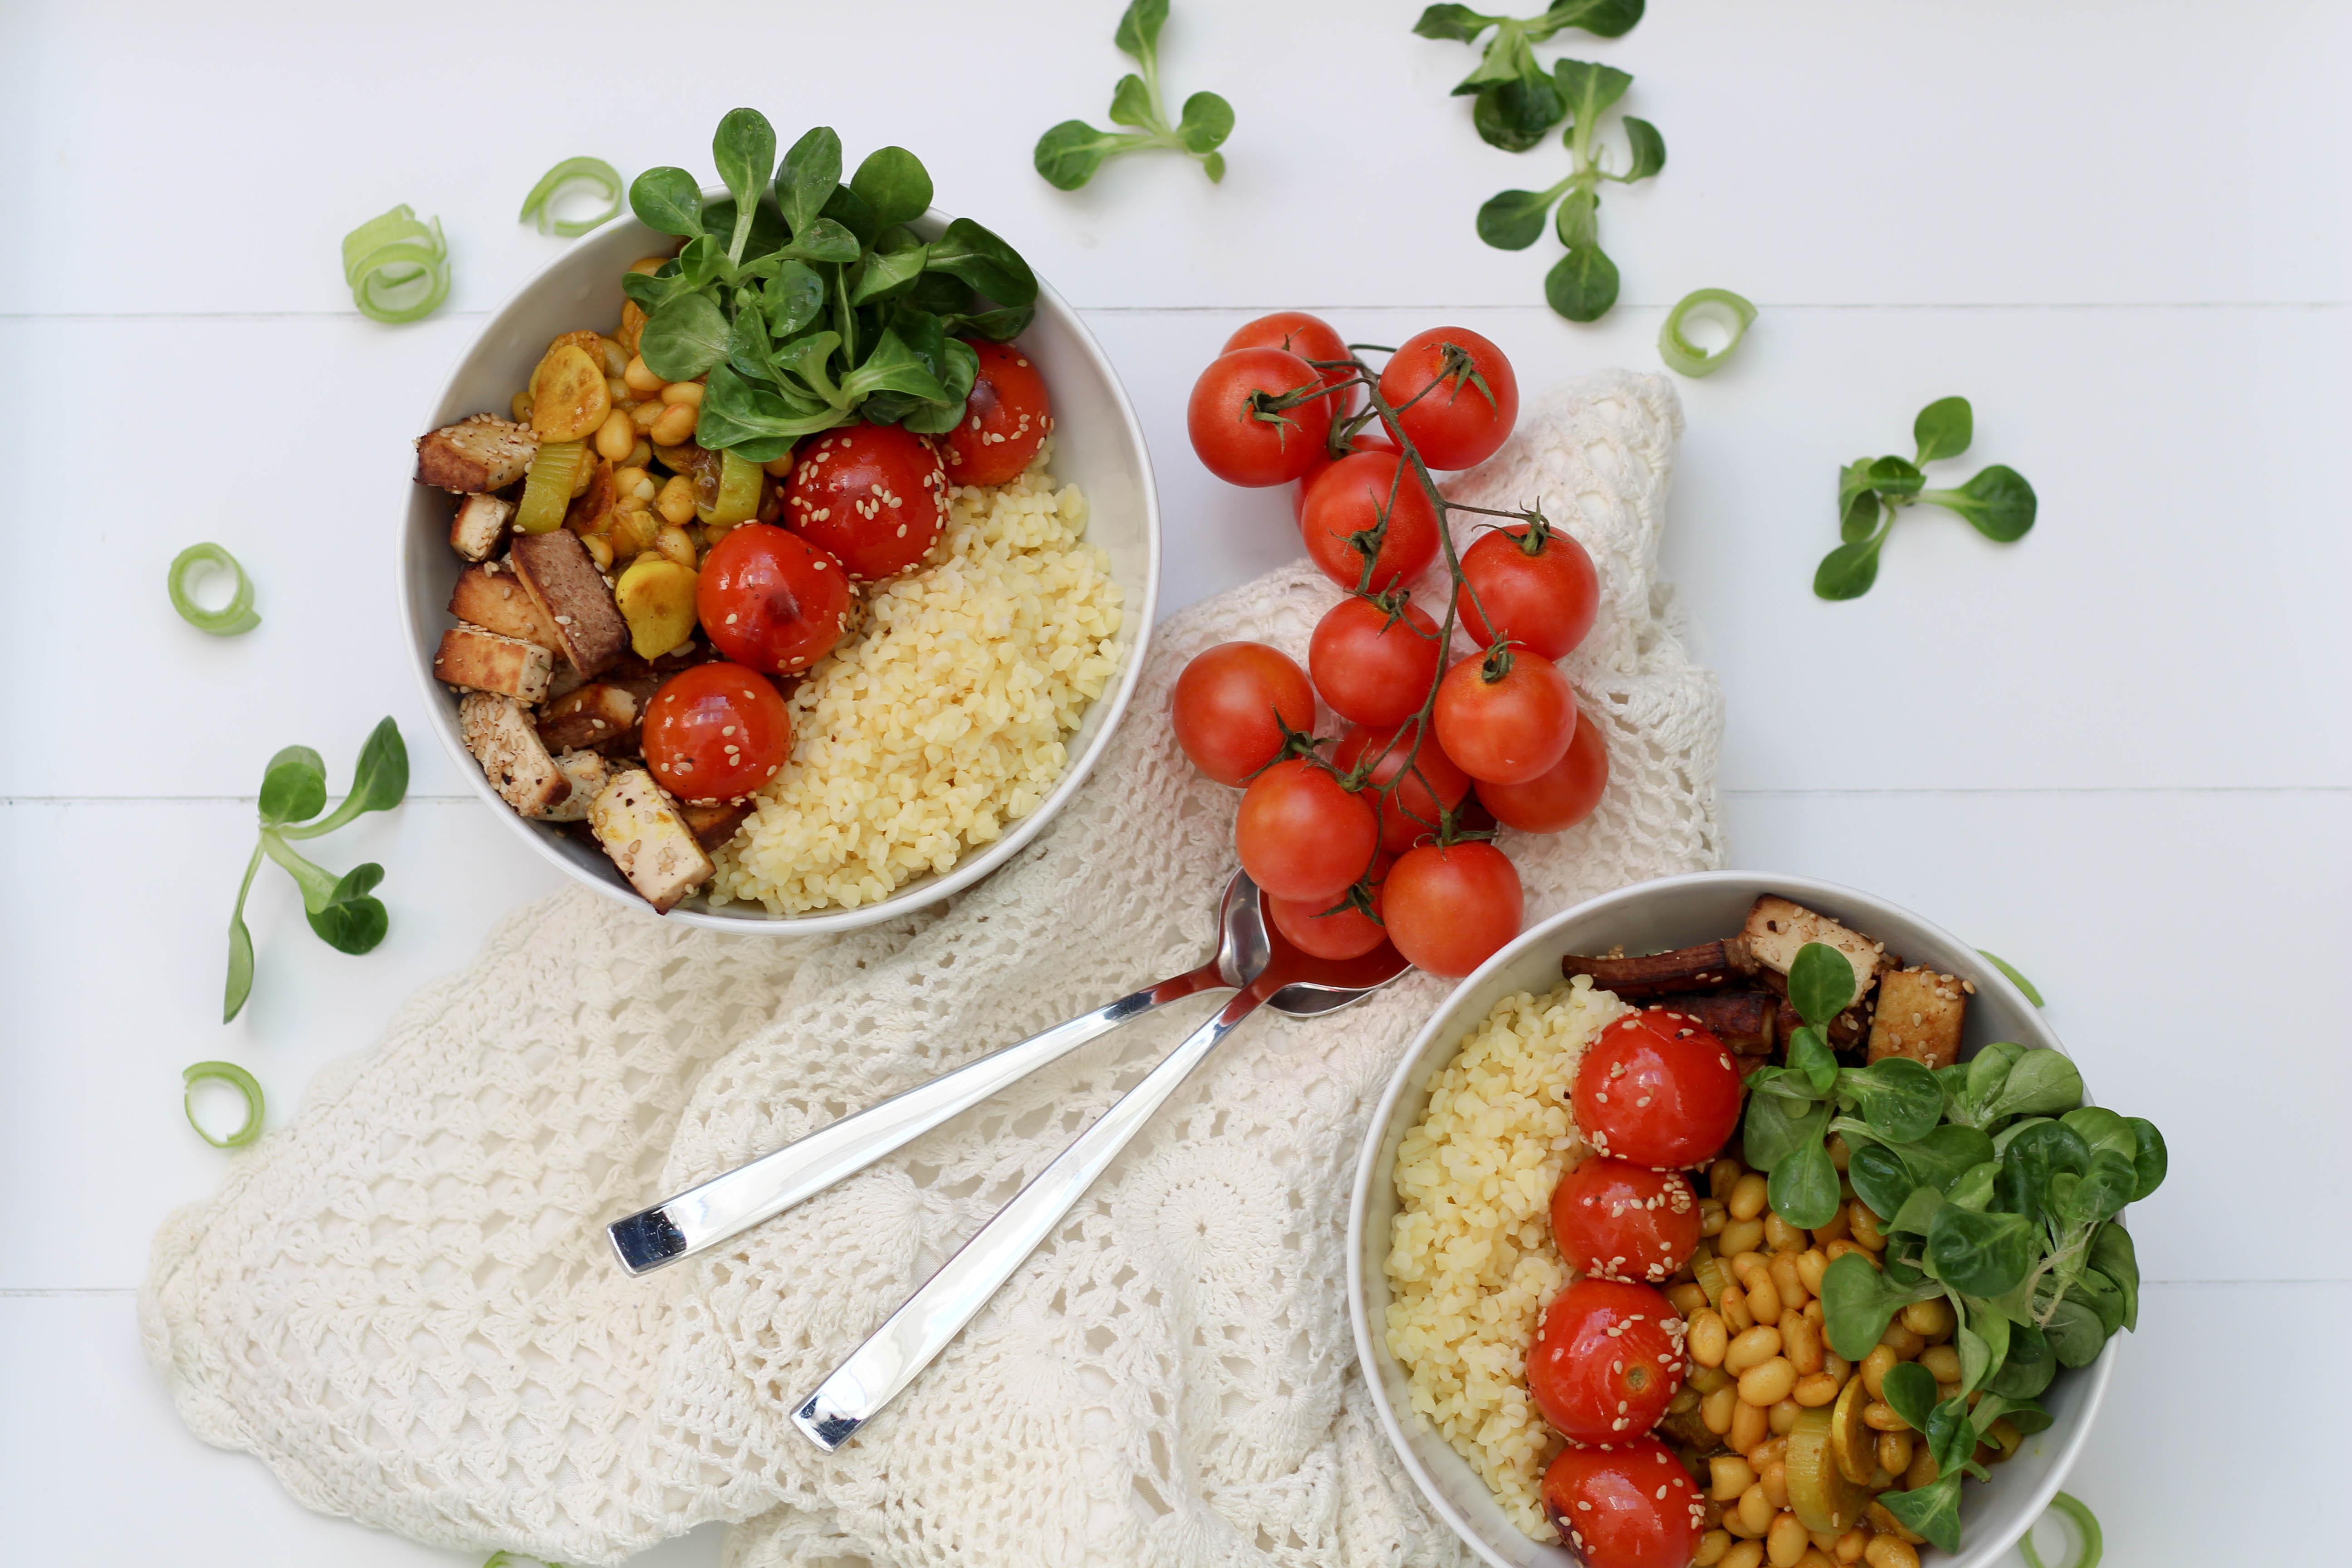 Dein Homespa - Vegan - Plantbased - Healthy - Lifestyle - Bowl - Bohnen - Kurkuma